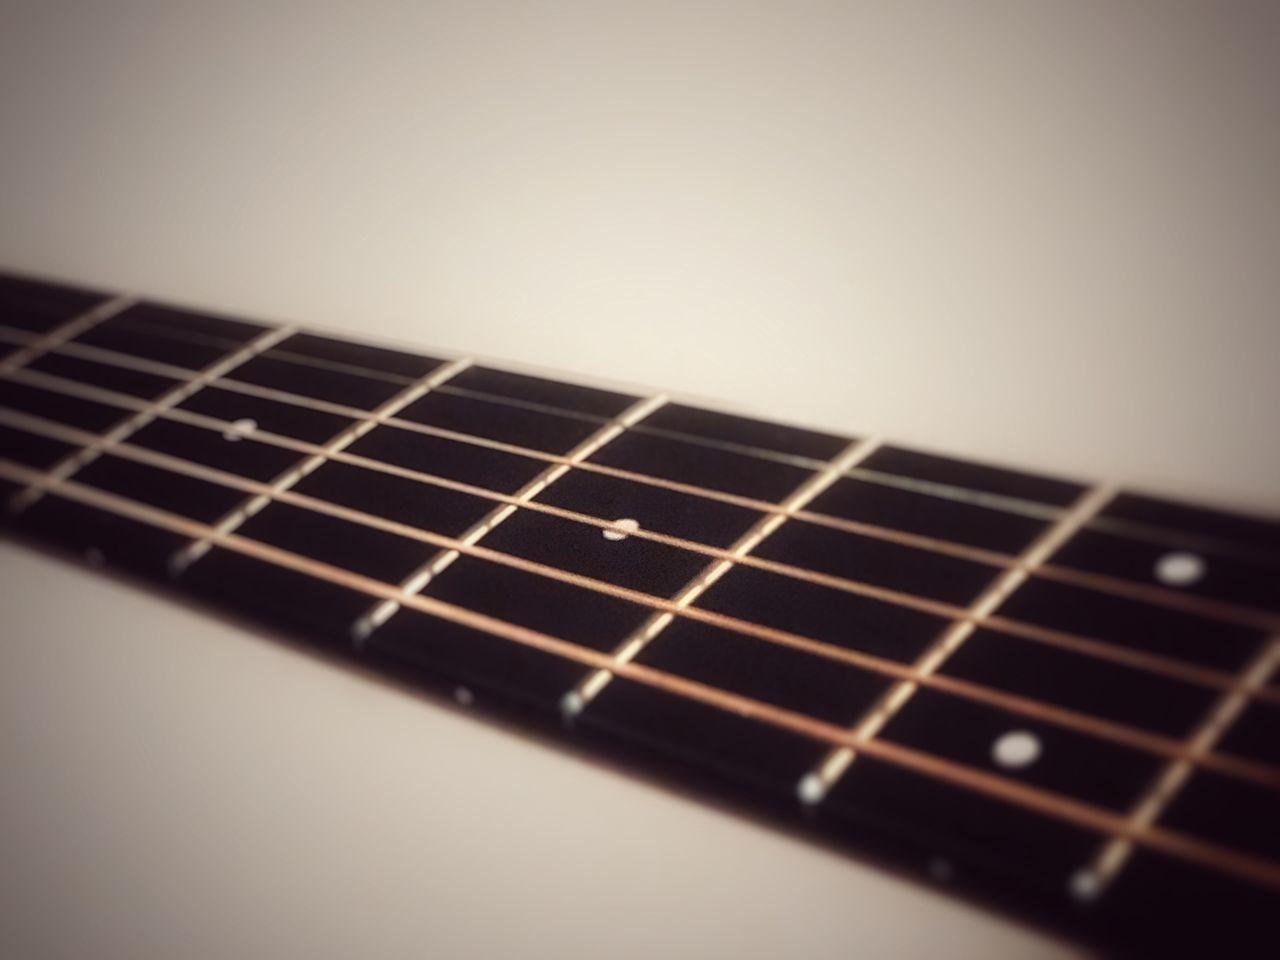 Guitar Music Musical Instrument Fretboard Acoustic Acoustic Guitar Praise Praising The Lord Praises Worship Worshiping God Worshipping God Worshipping Jesus Praise And Worship Neozeke